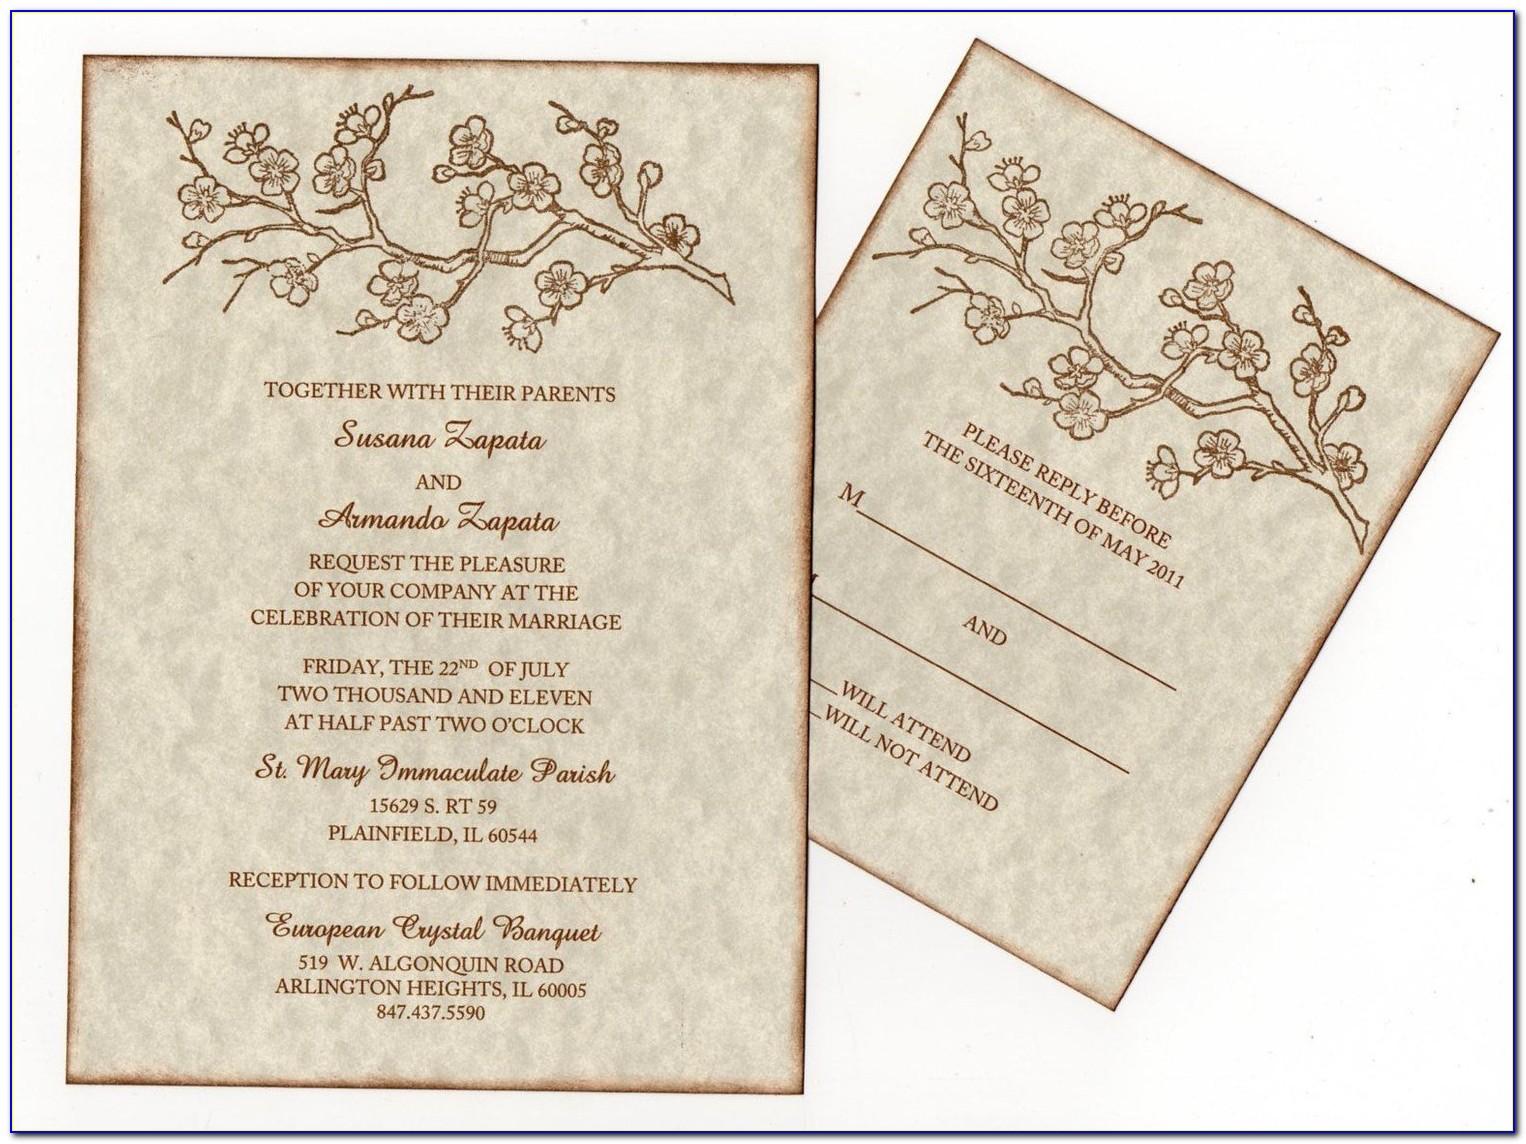 Hindu Wedding Cards Templates In English